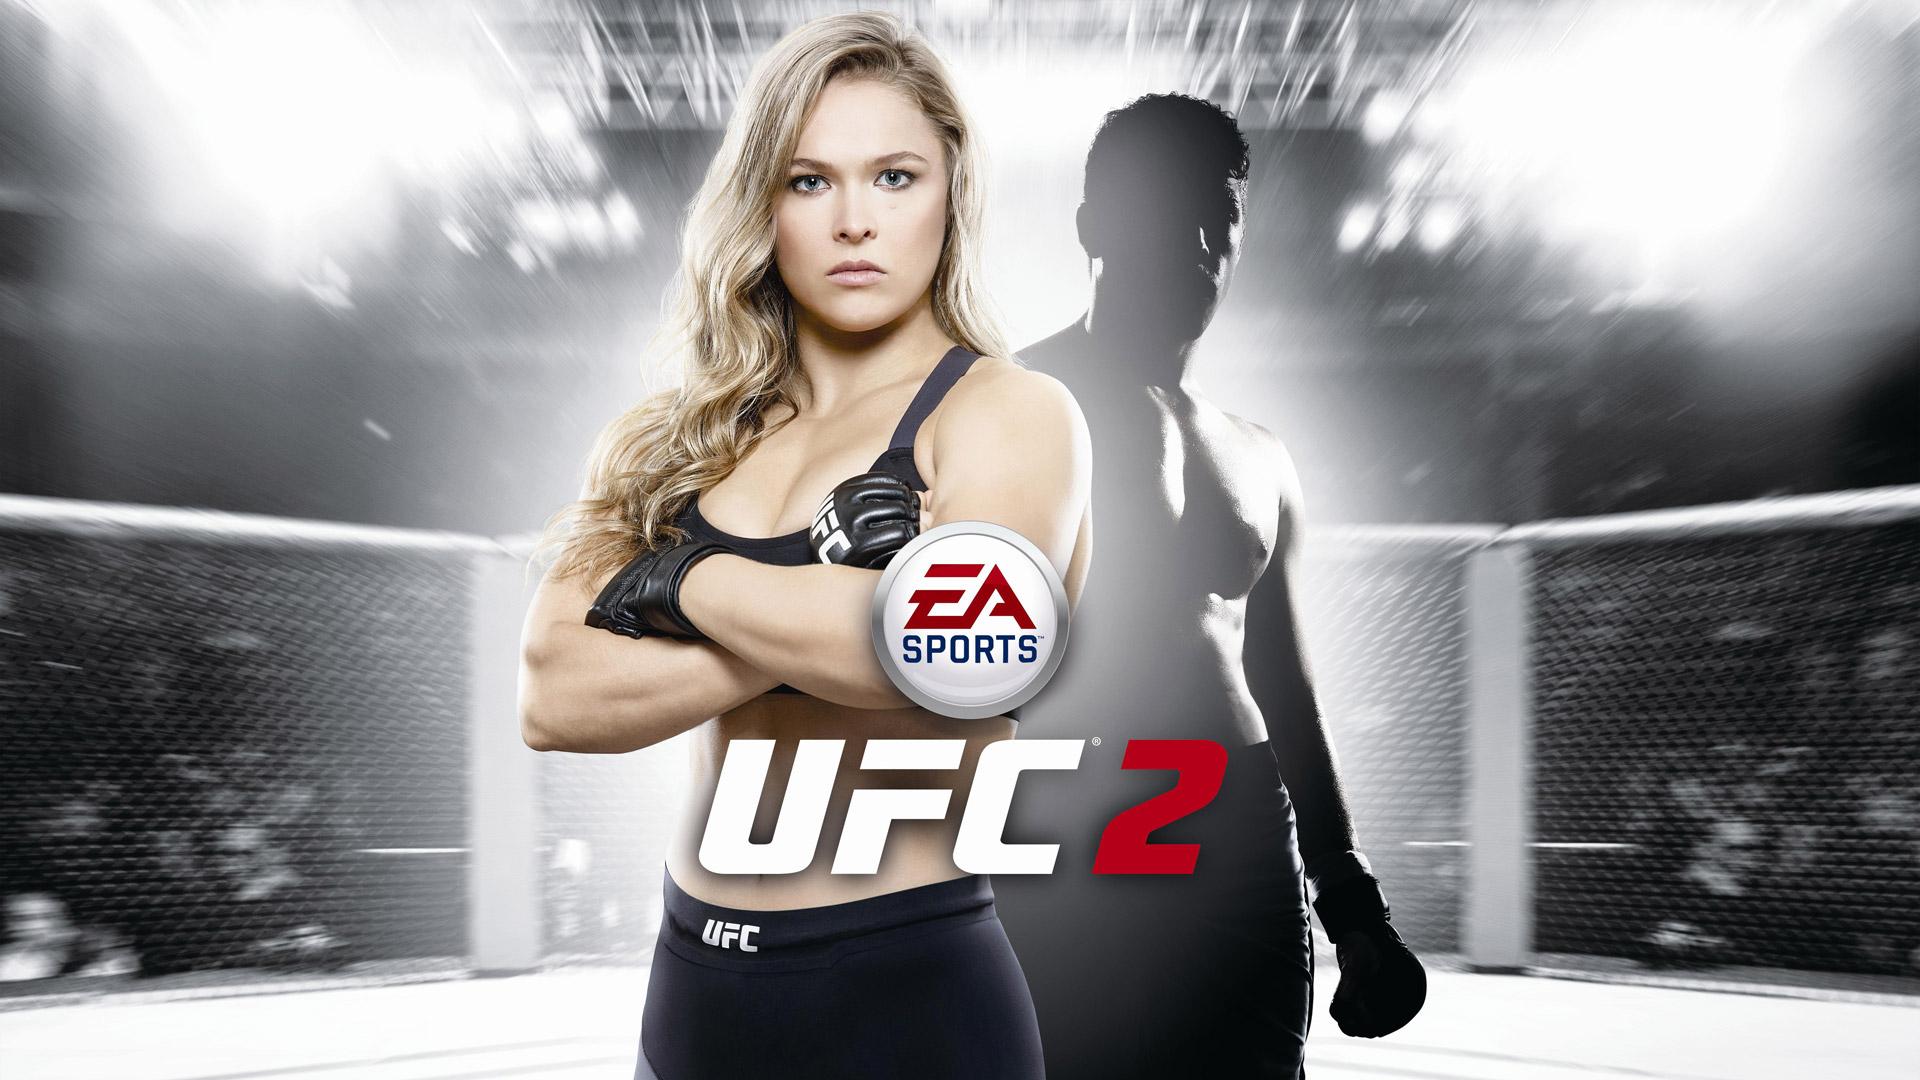 EA Sports UFC 2 Wallpaper in 1920x1080